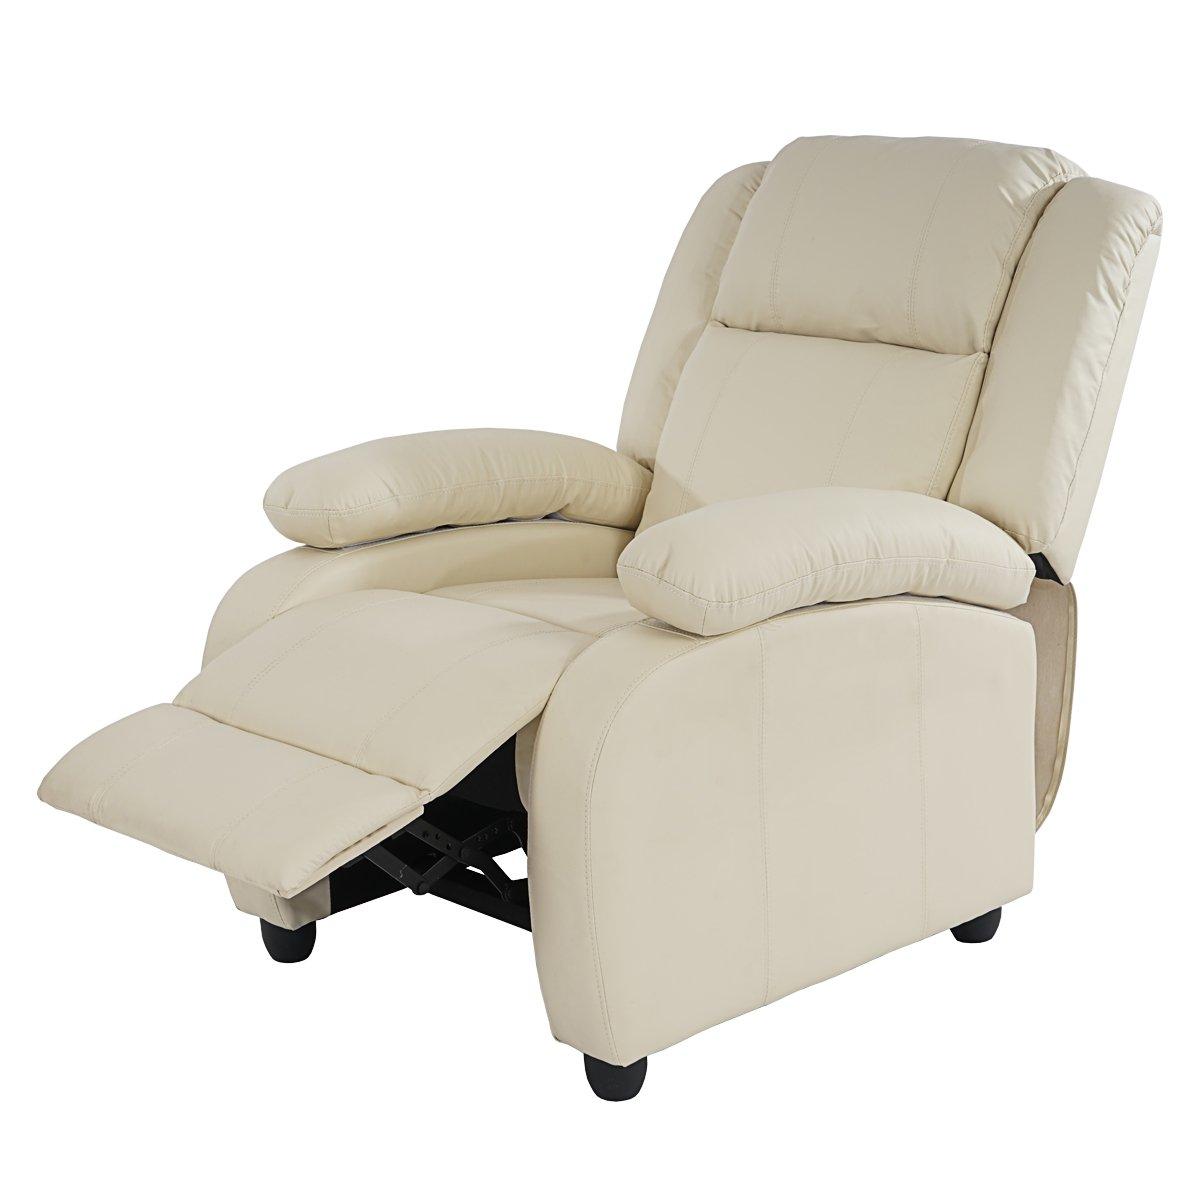 Relaxsessel günstig  Fernsehsessel Relaxsessel Liege Sessel Lincoln, Kunstleder ~ creme ...